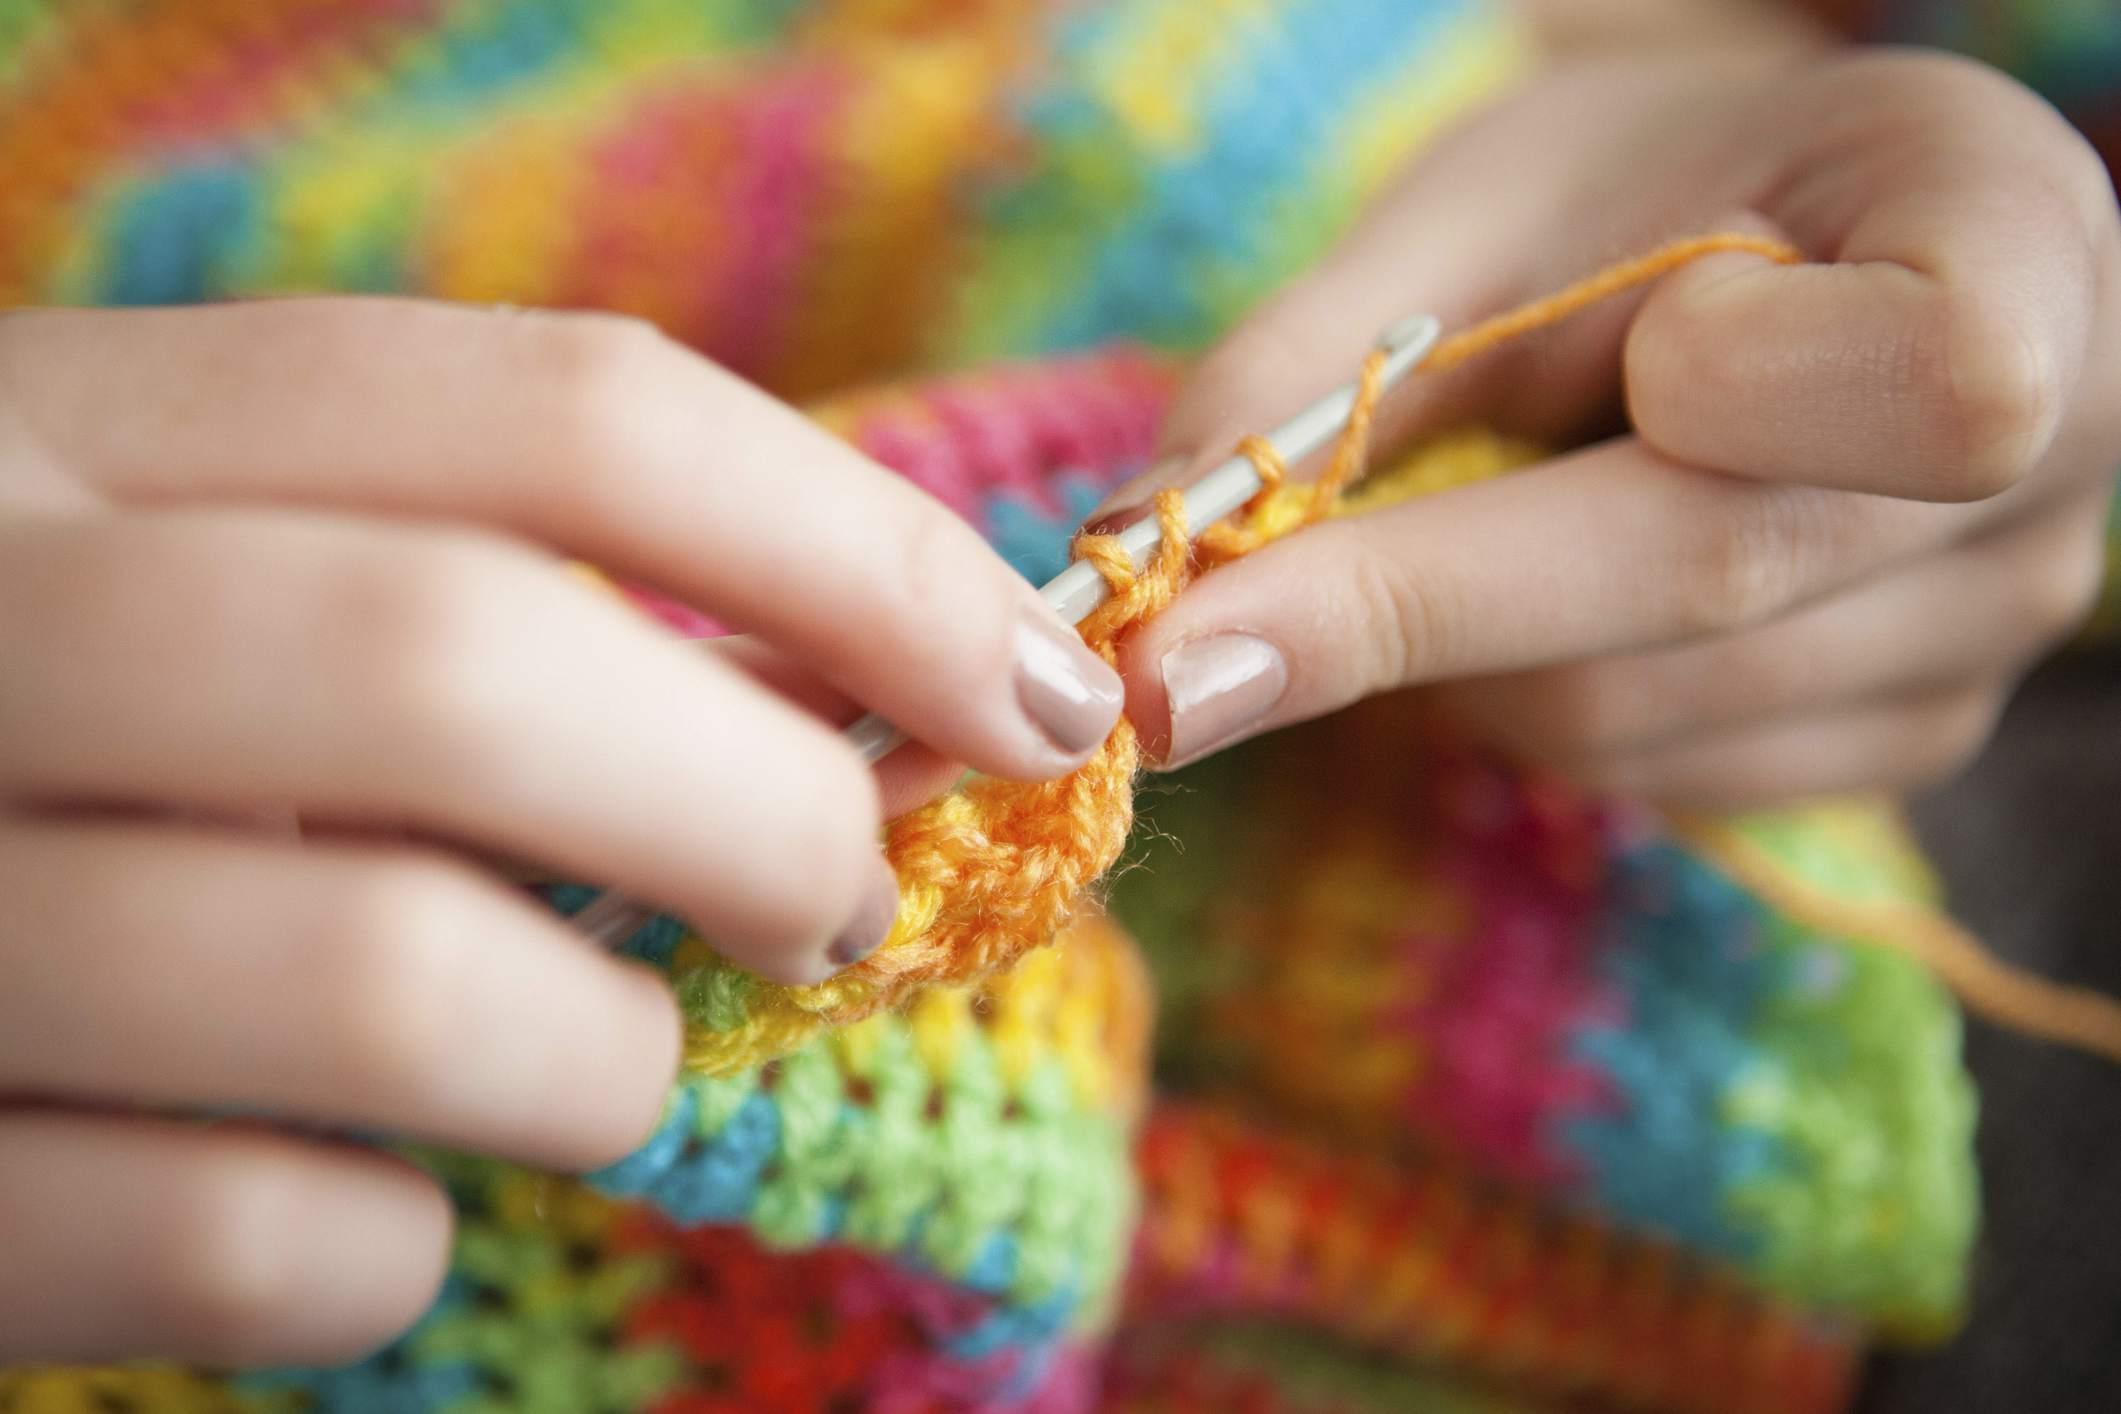 Women crocheting a rainbow blanket